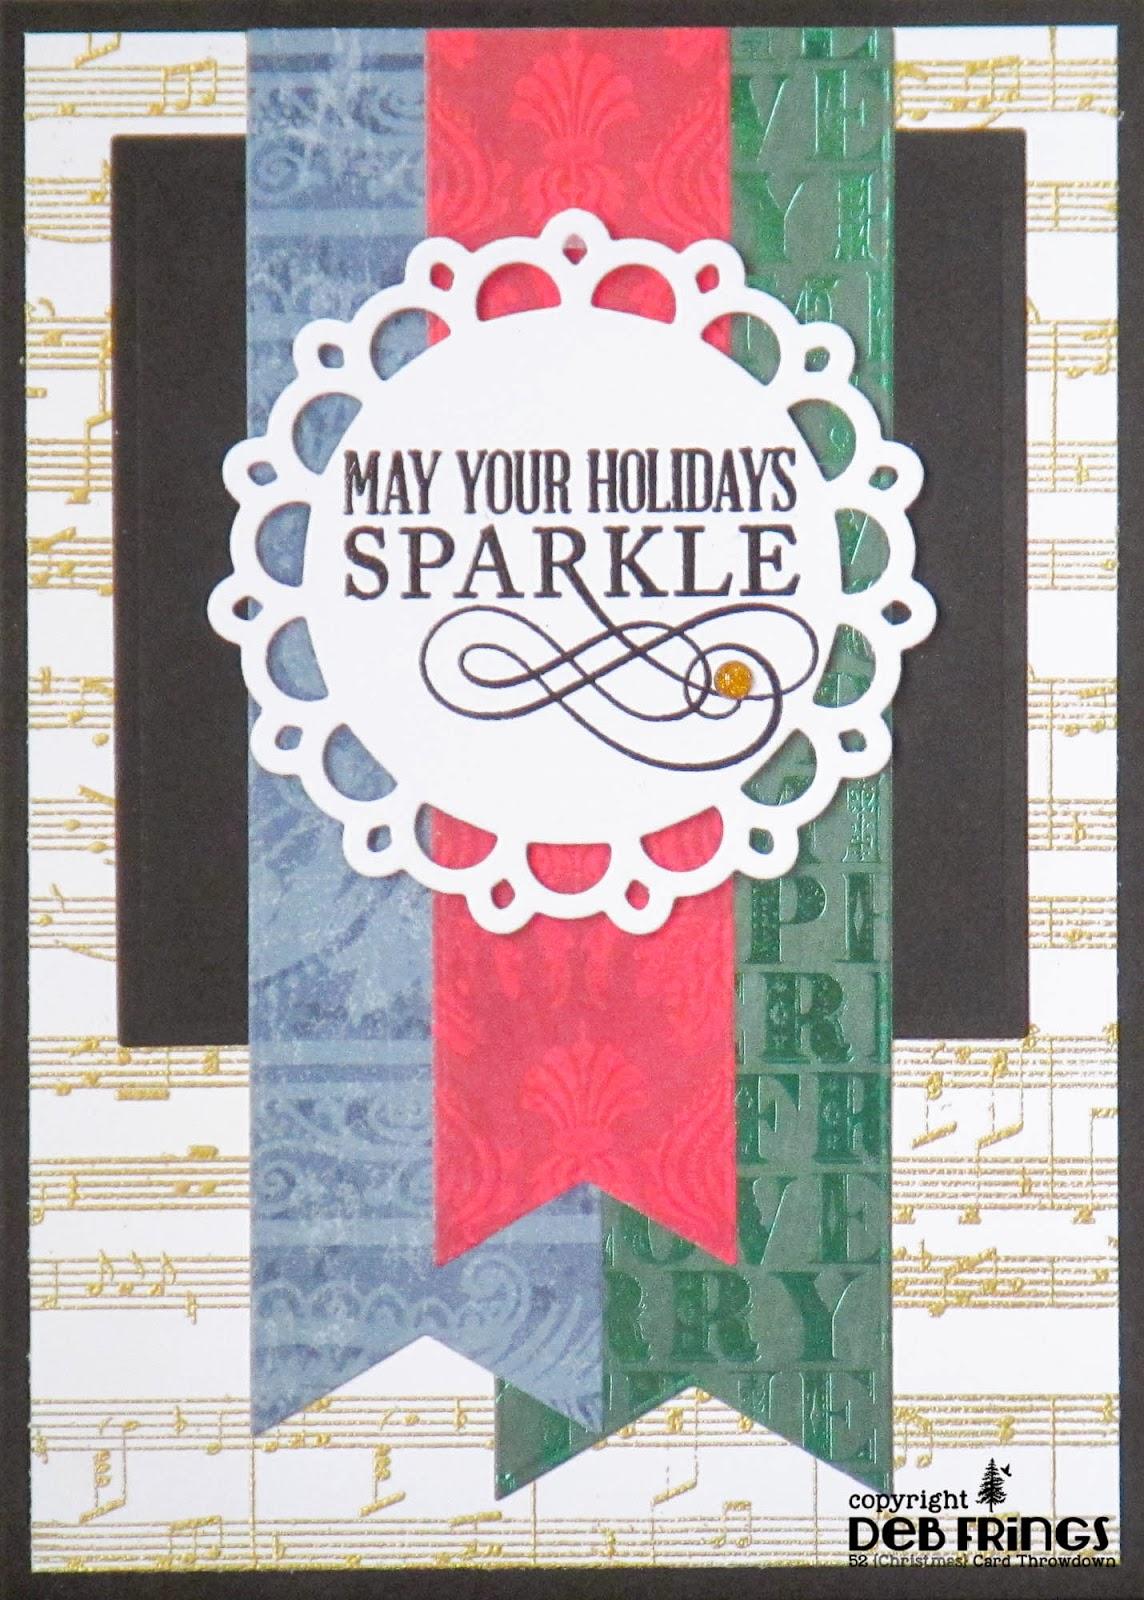 Holidays Sparkle - photo by Deborah Frings - Deborah's Gems